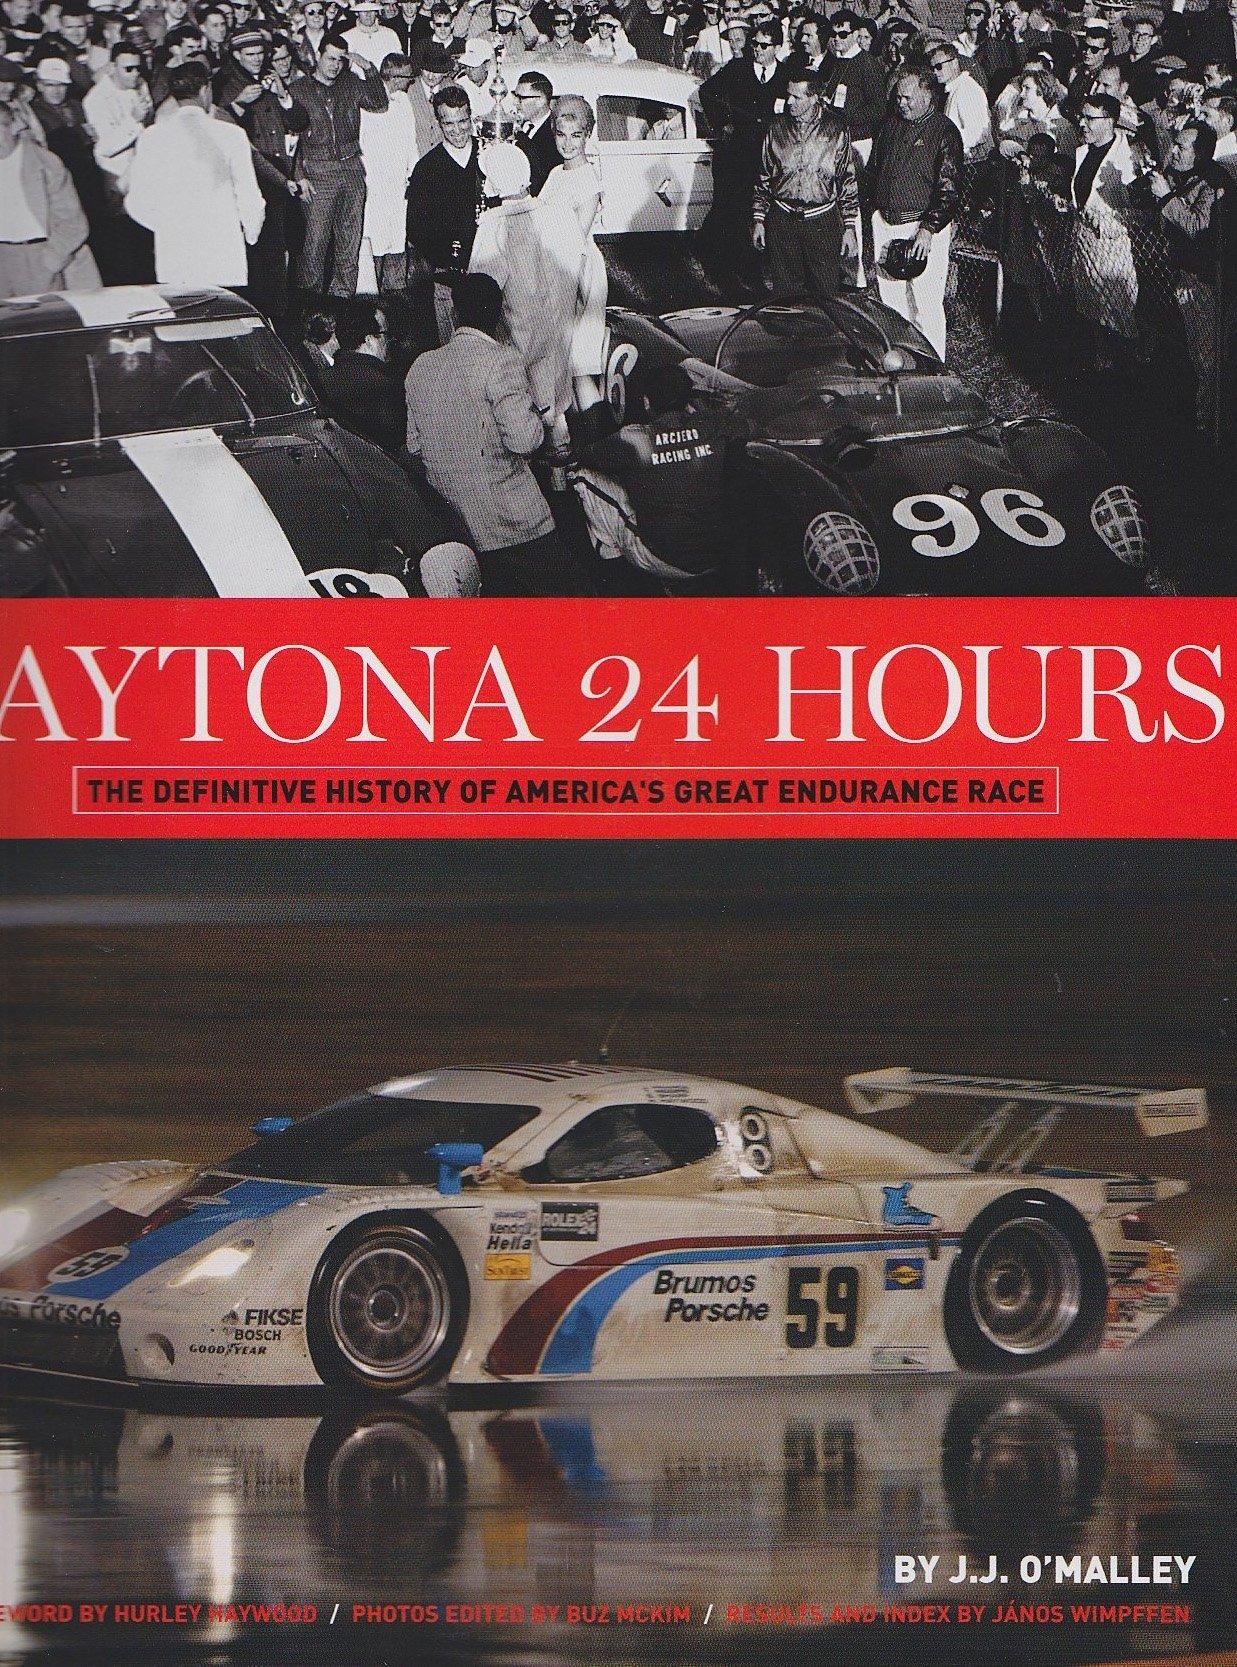 Daytona 24 Hours: The Definitive History of America's Great Endurance Race